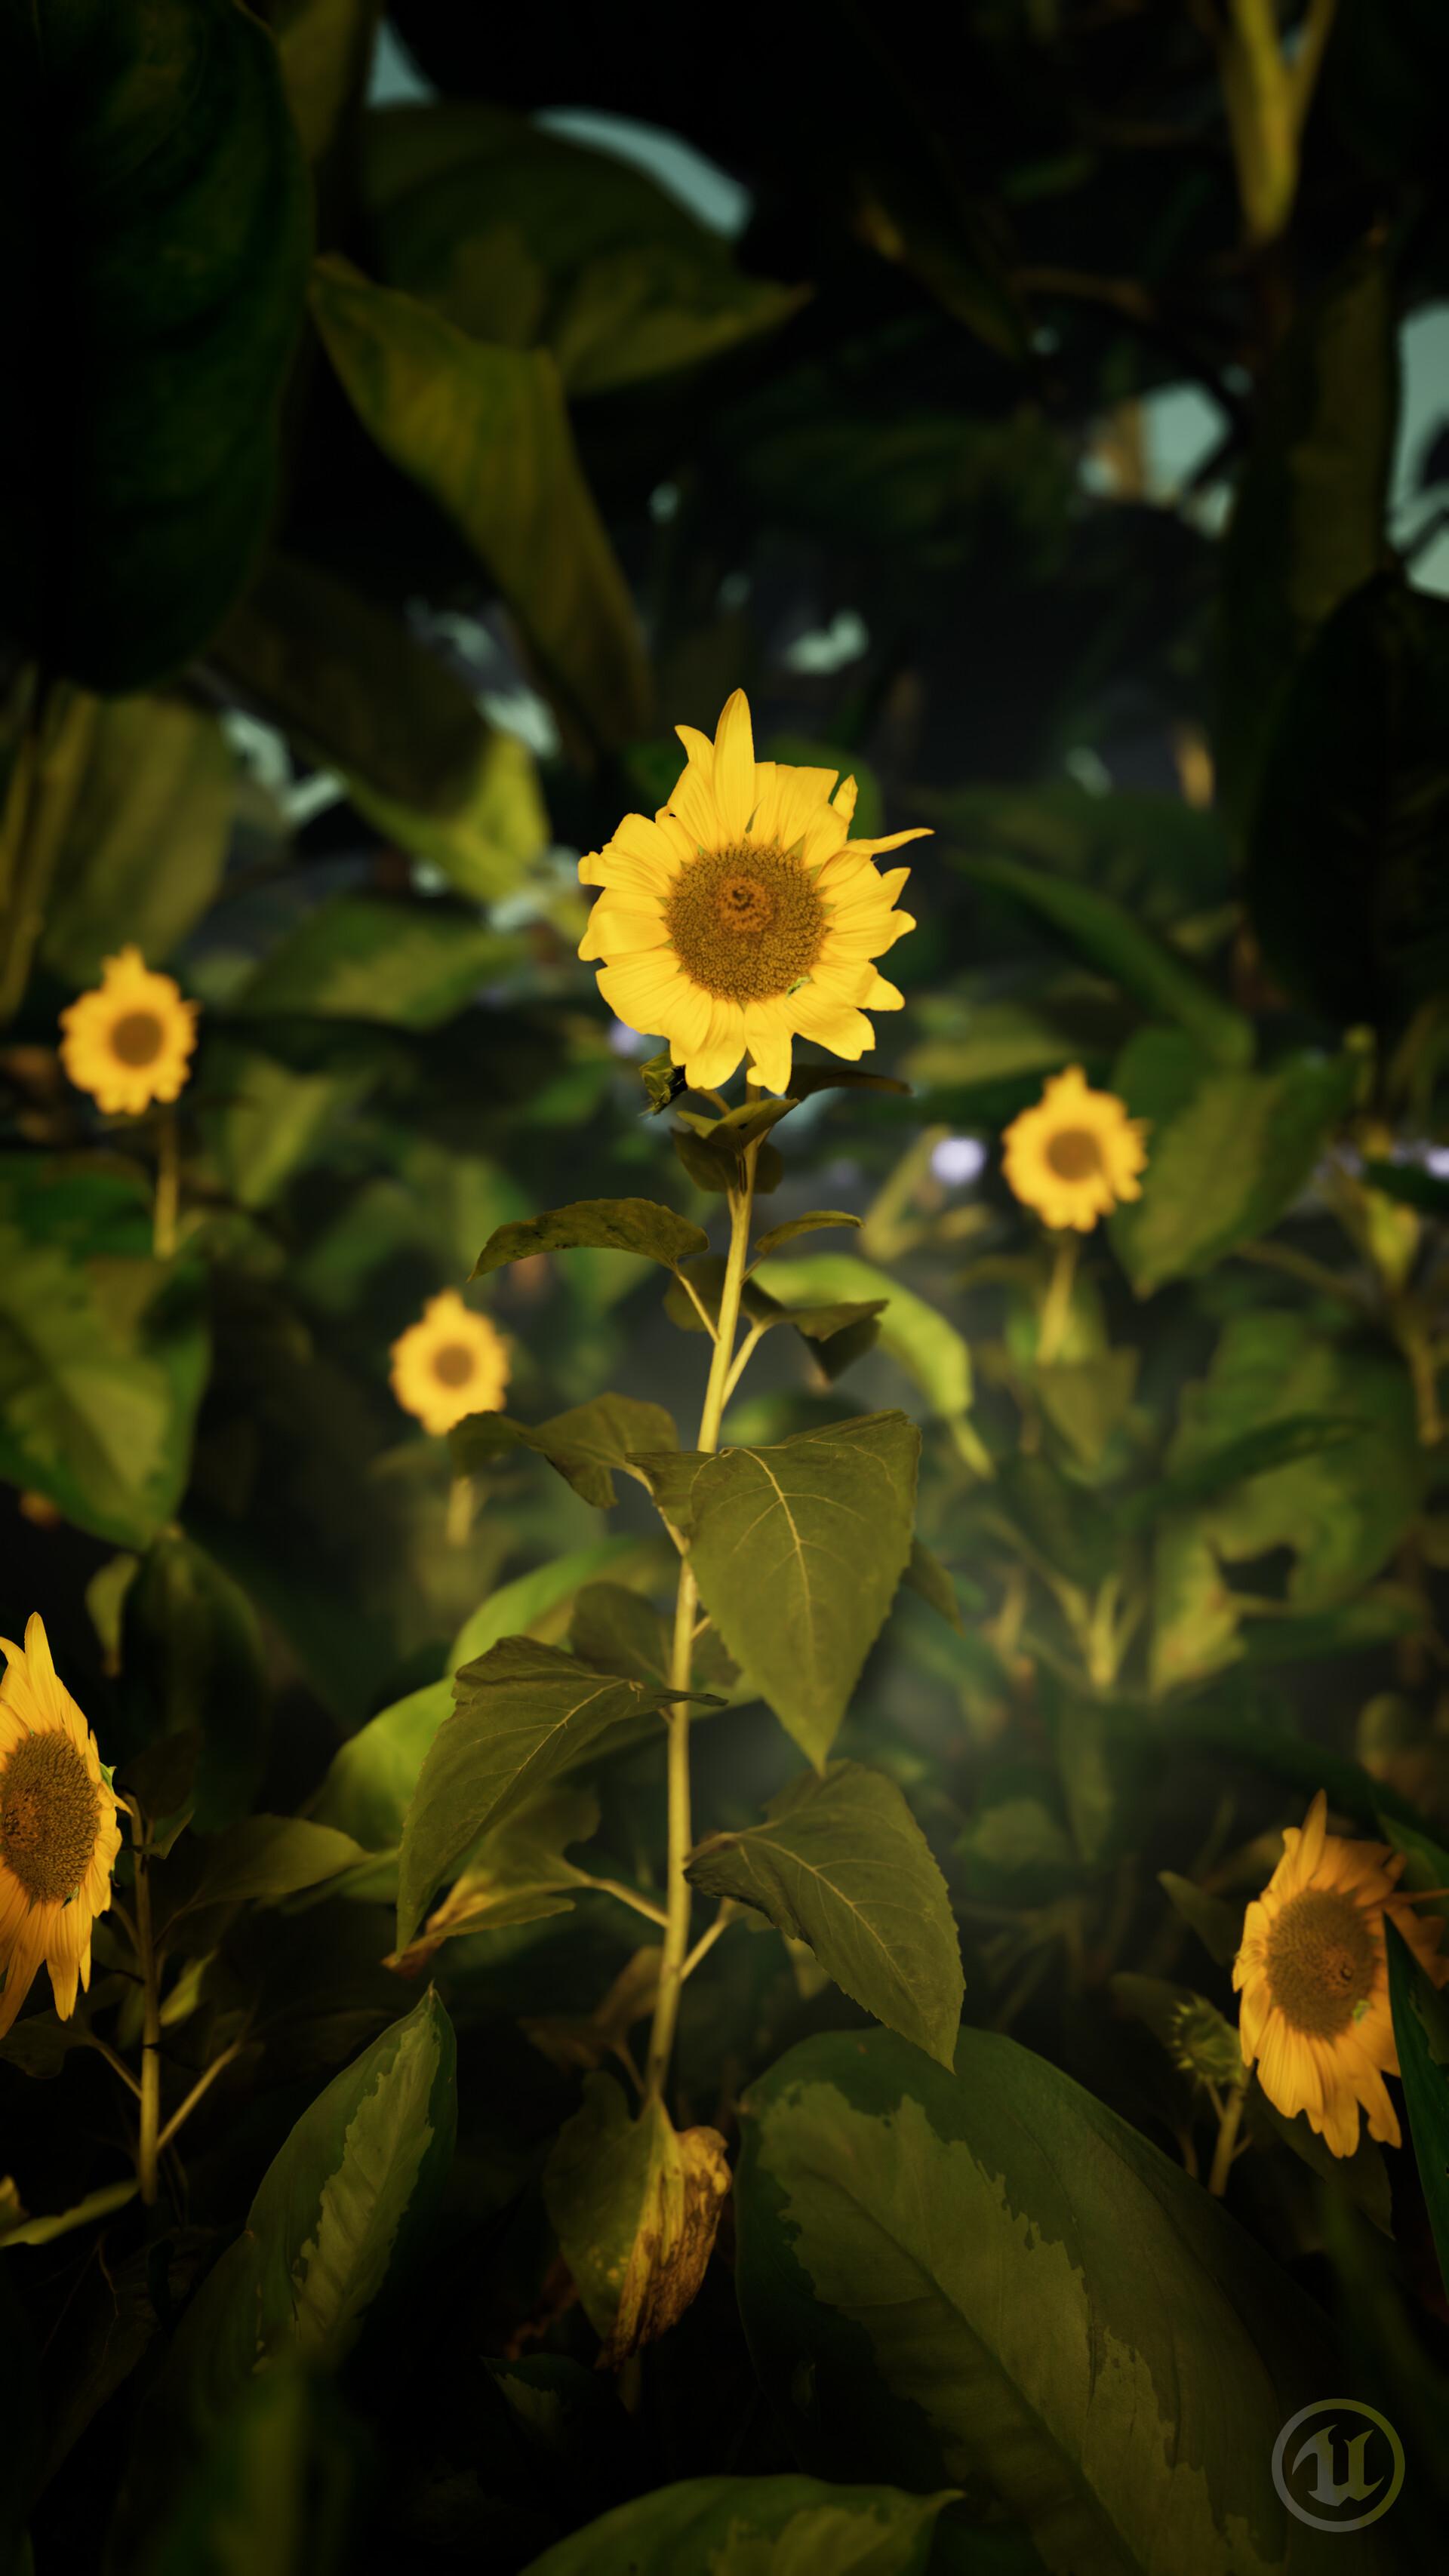 Sunflower - Photorealism